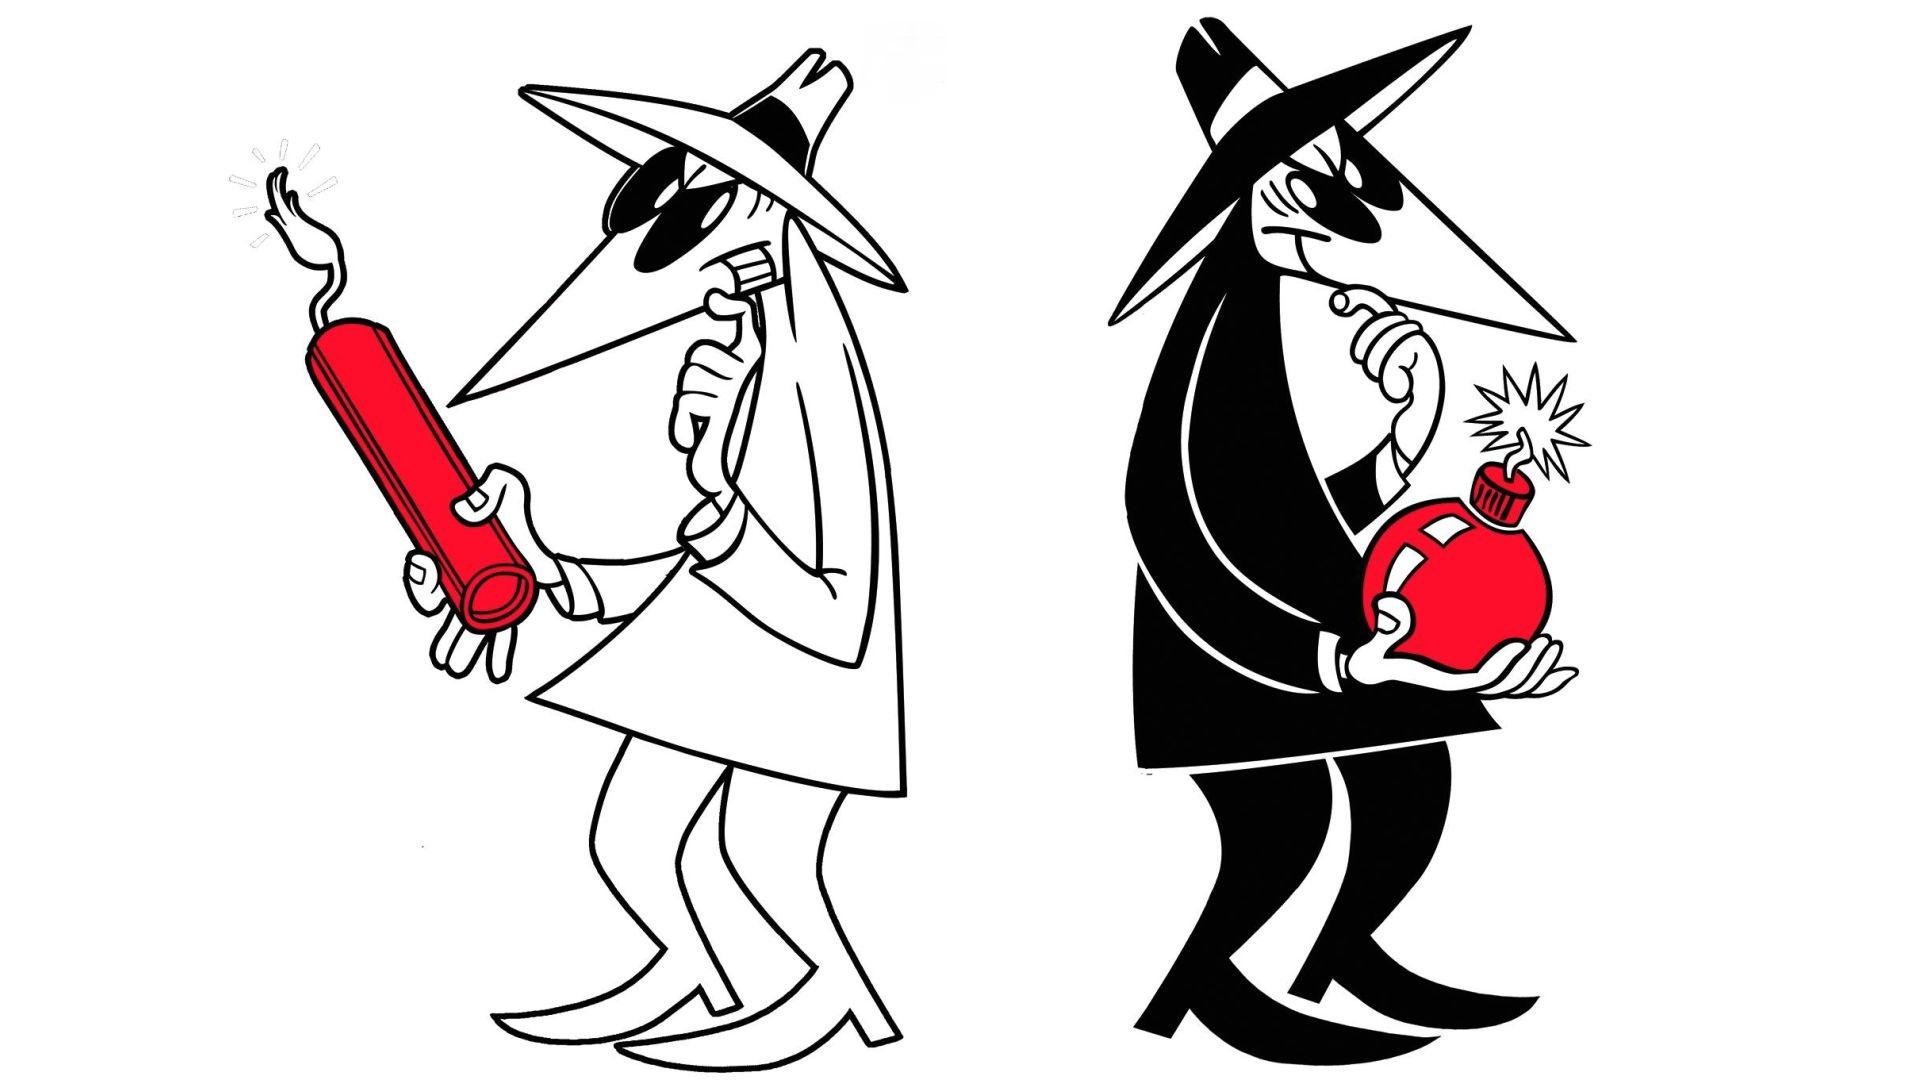 Spy vs Spy Wallpaper 2jpeg 1920x1080